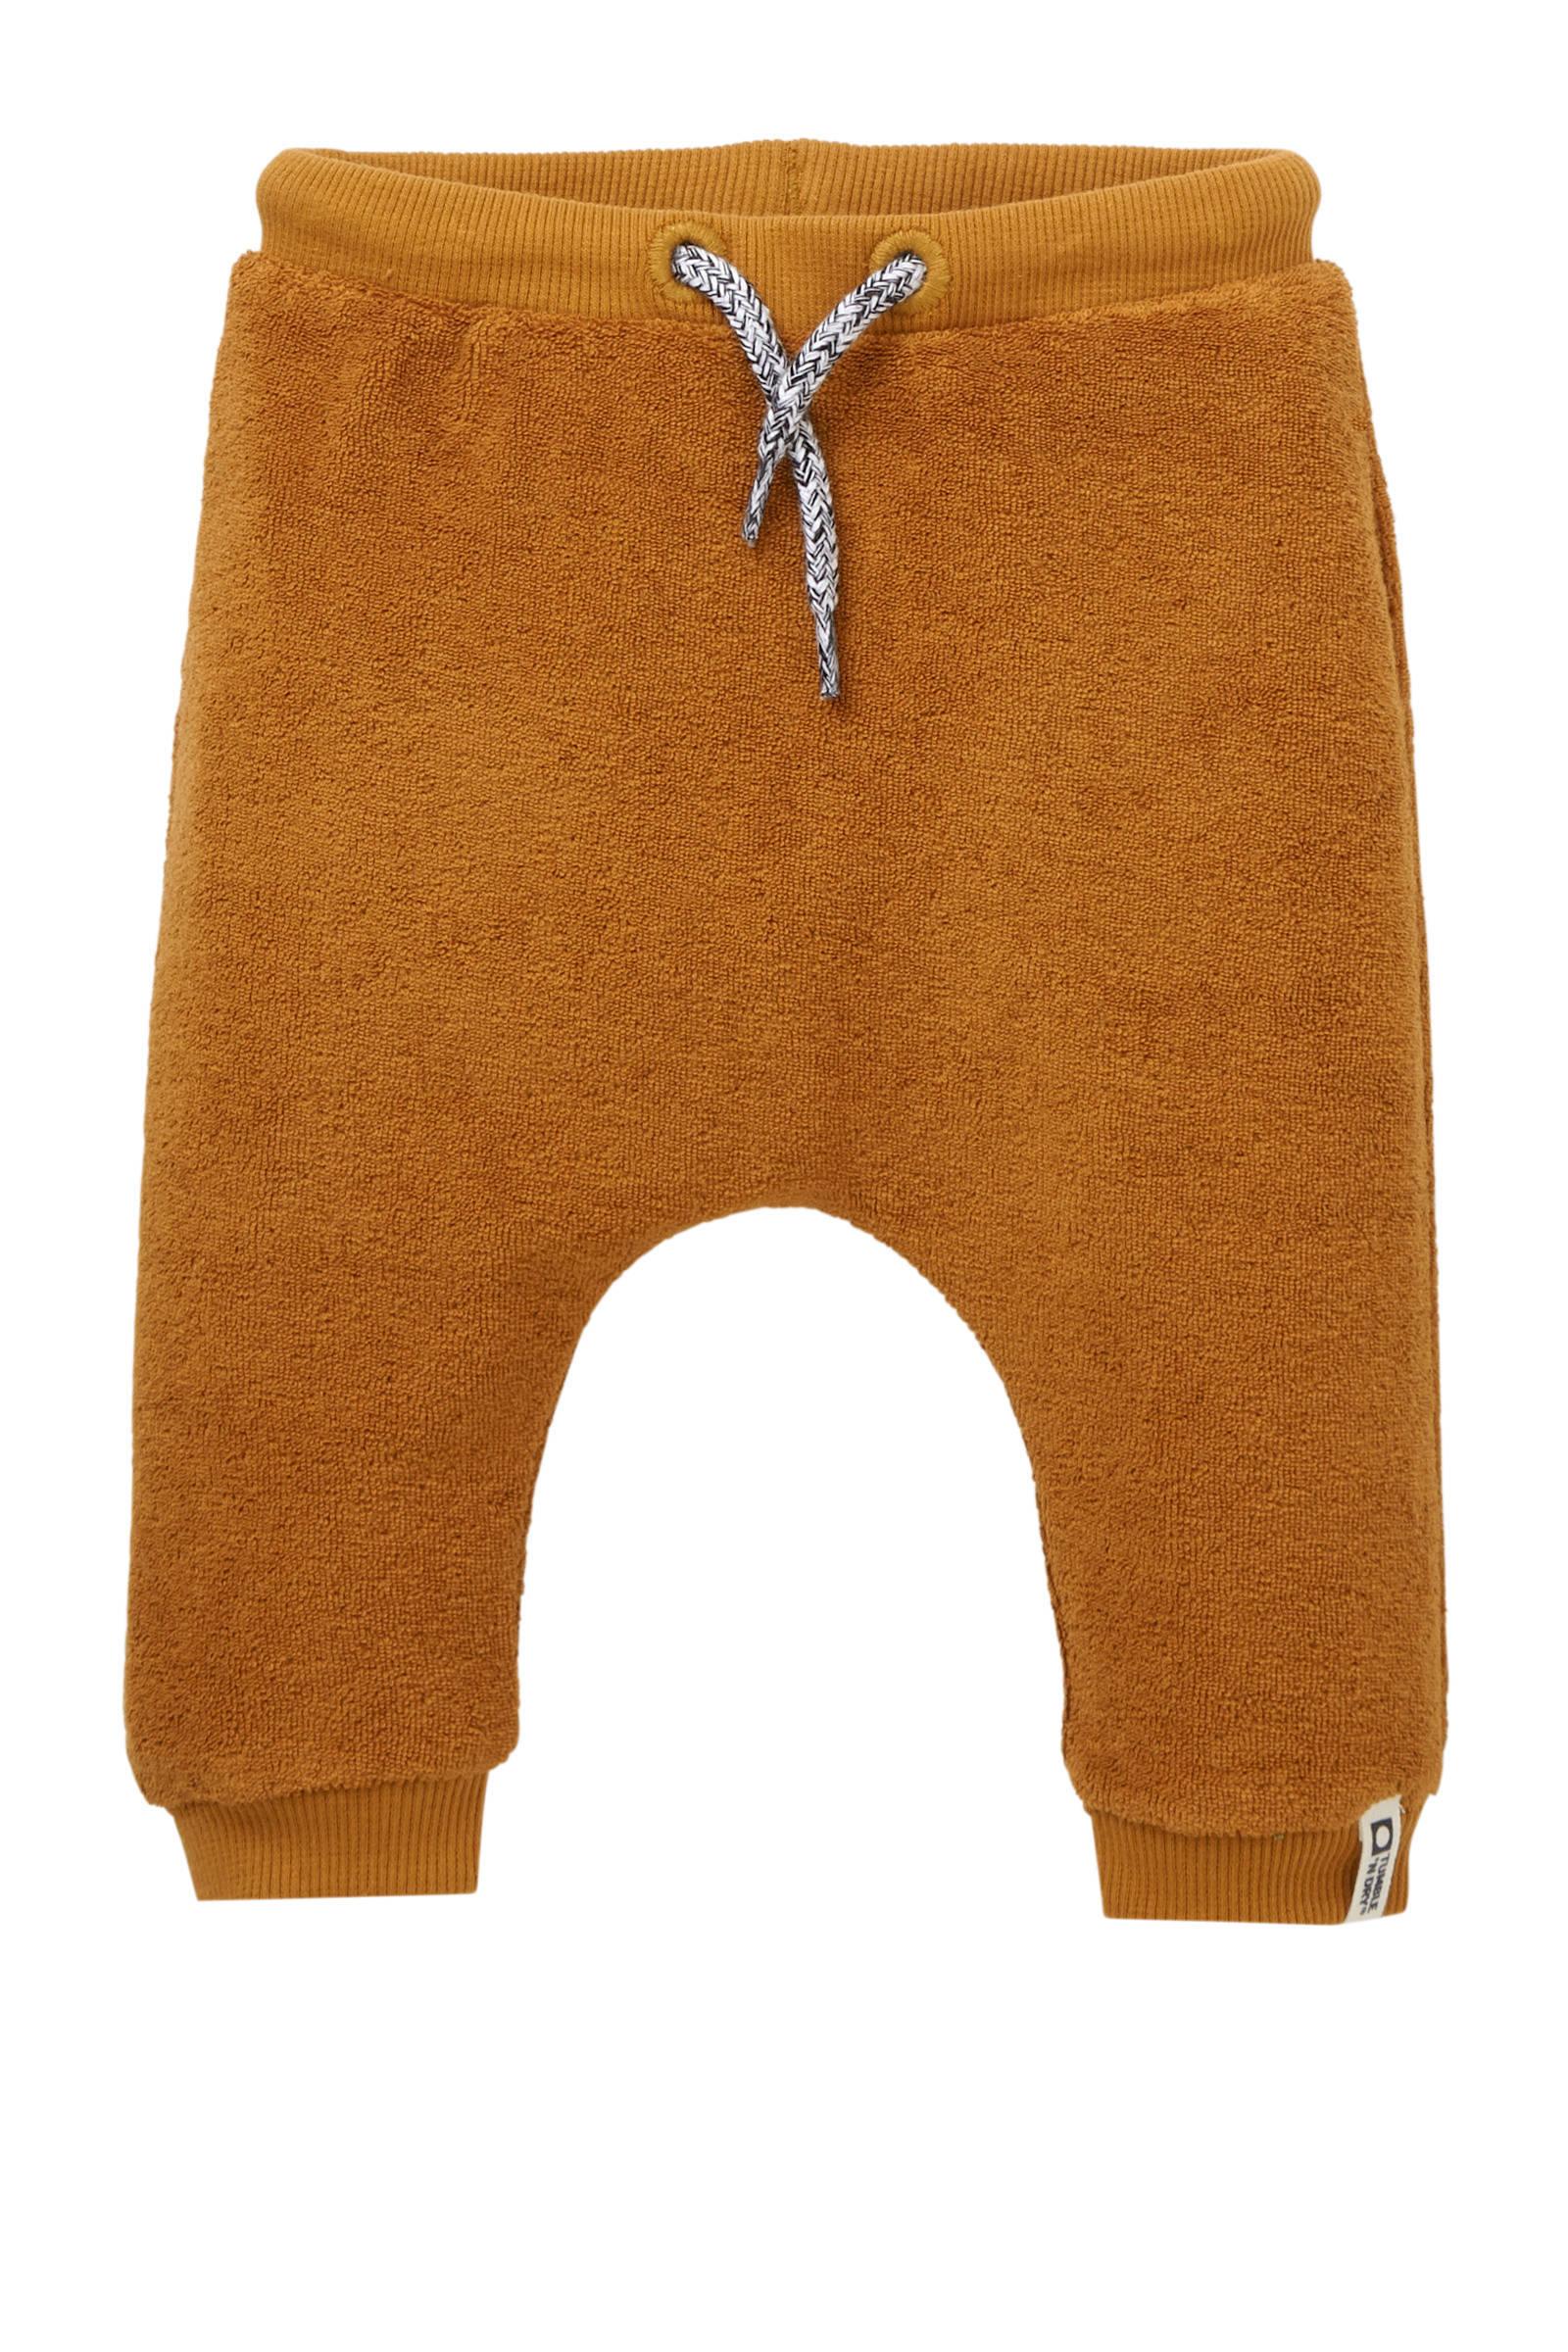 Tumble 'n Dry Zero newborn badstof sweatpants Xeff okerbruin (jongens)